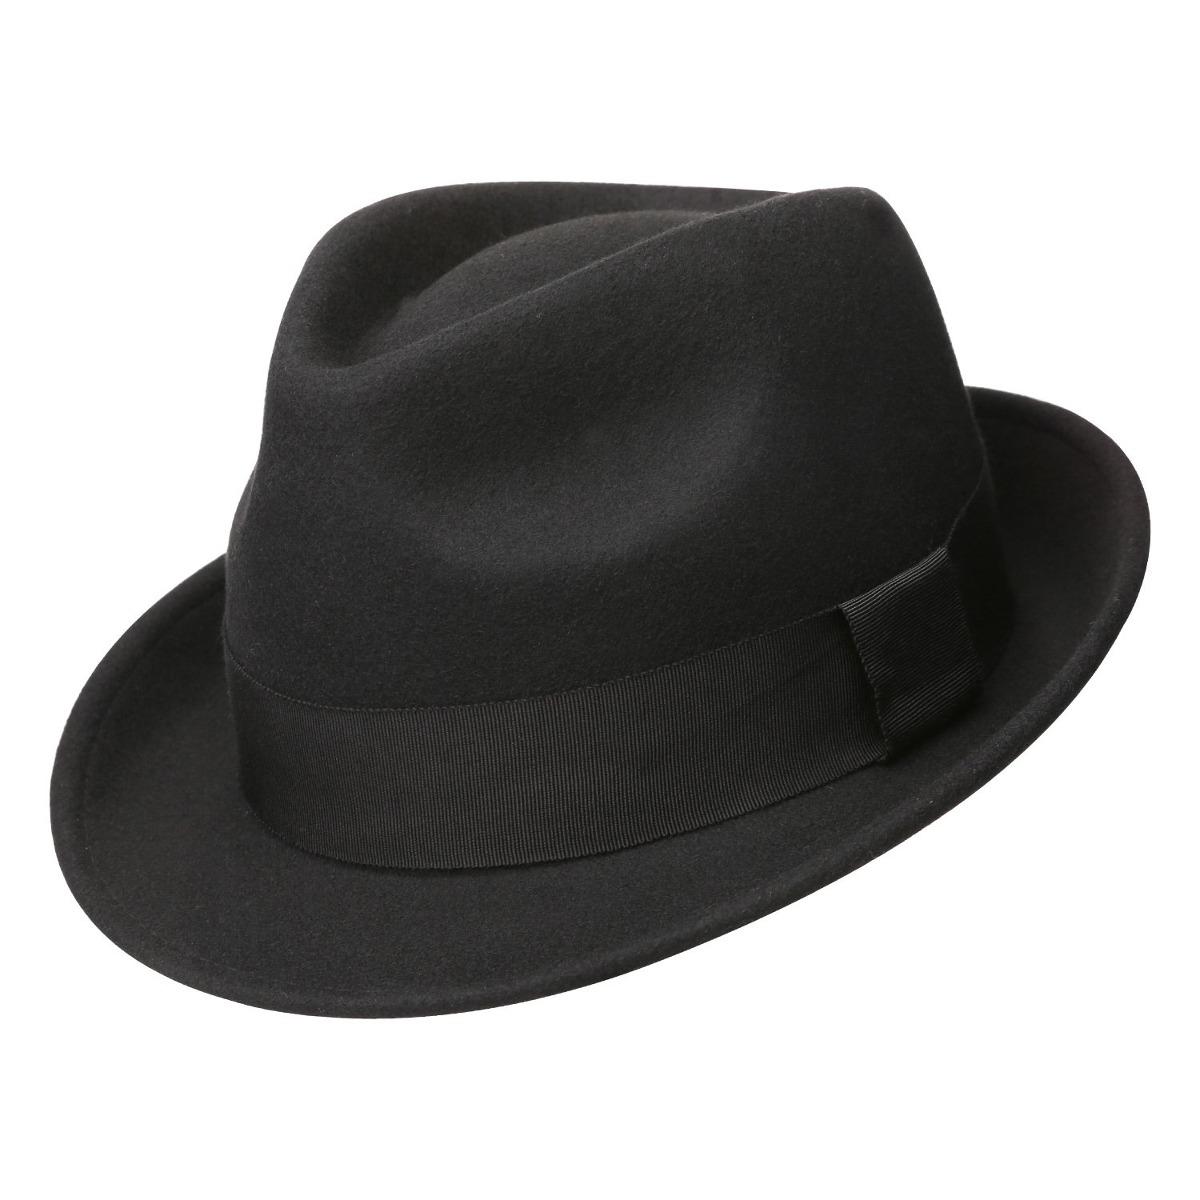 Sedancasesa Sombrero Fedora Fedora Para Hombre Sombreros. - U S 67 ... 6bd4183392f